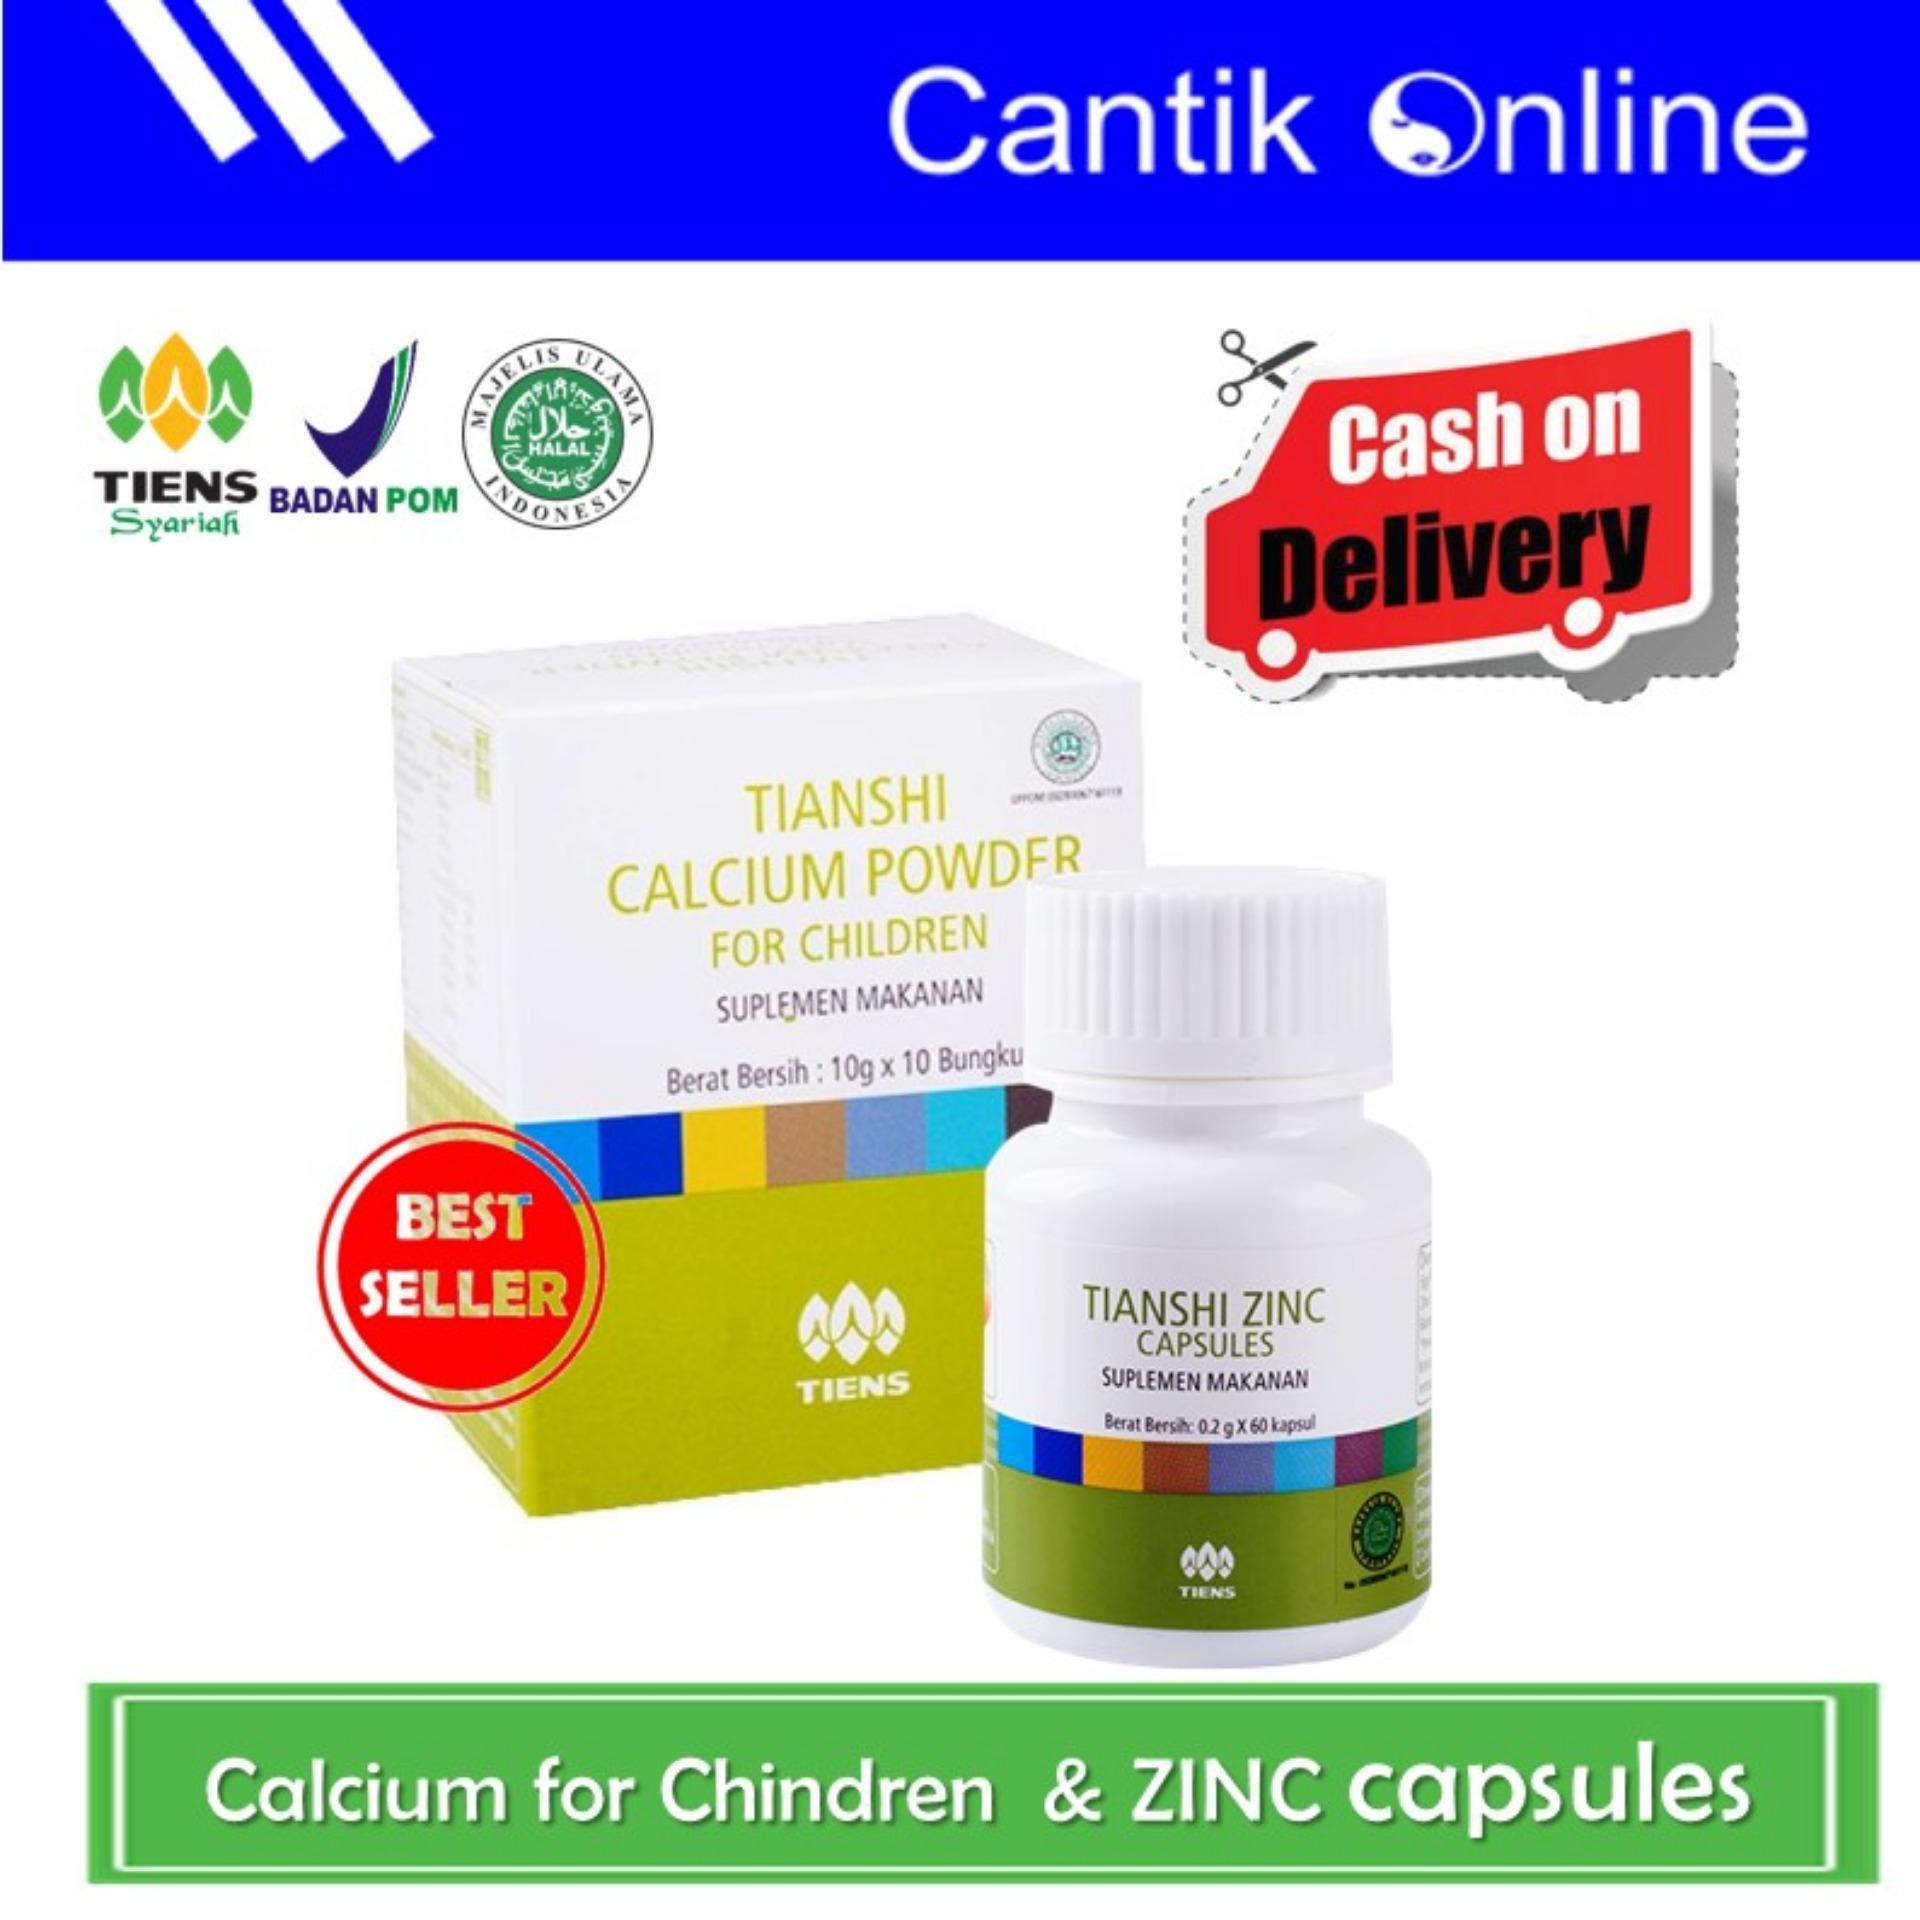 Tiens Paket Penggemuk Badan Premium Free Kuas Masker Zinc Spirulina 1 Kecerdasan Pertumbuhan Anak Hemat 2 Calcium For Children